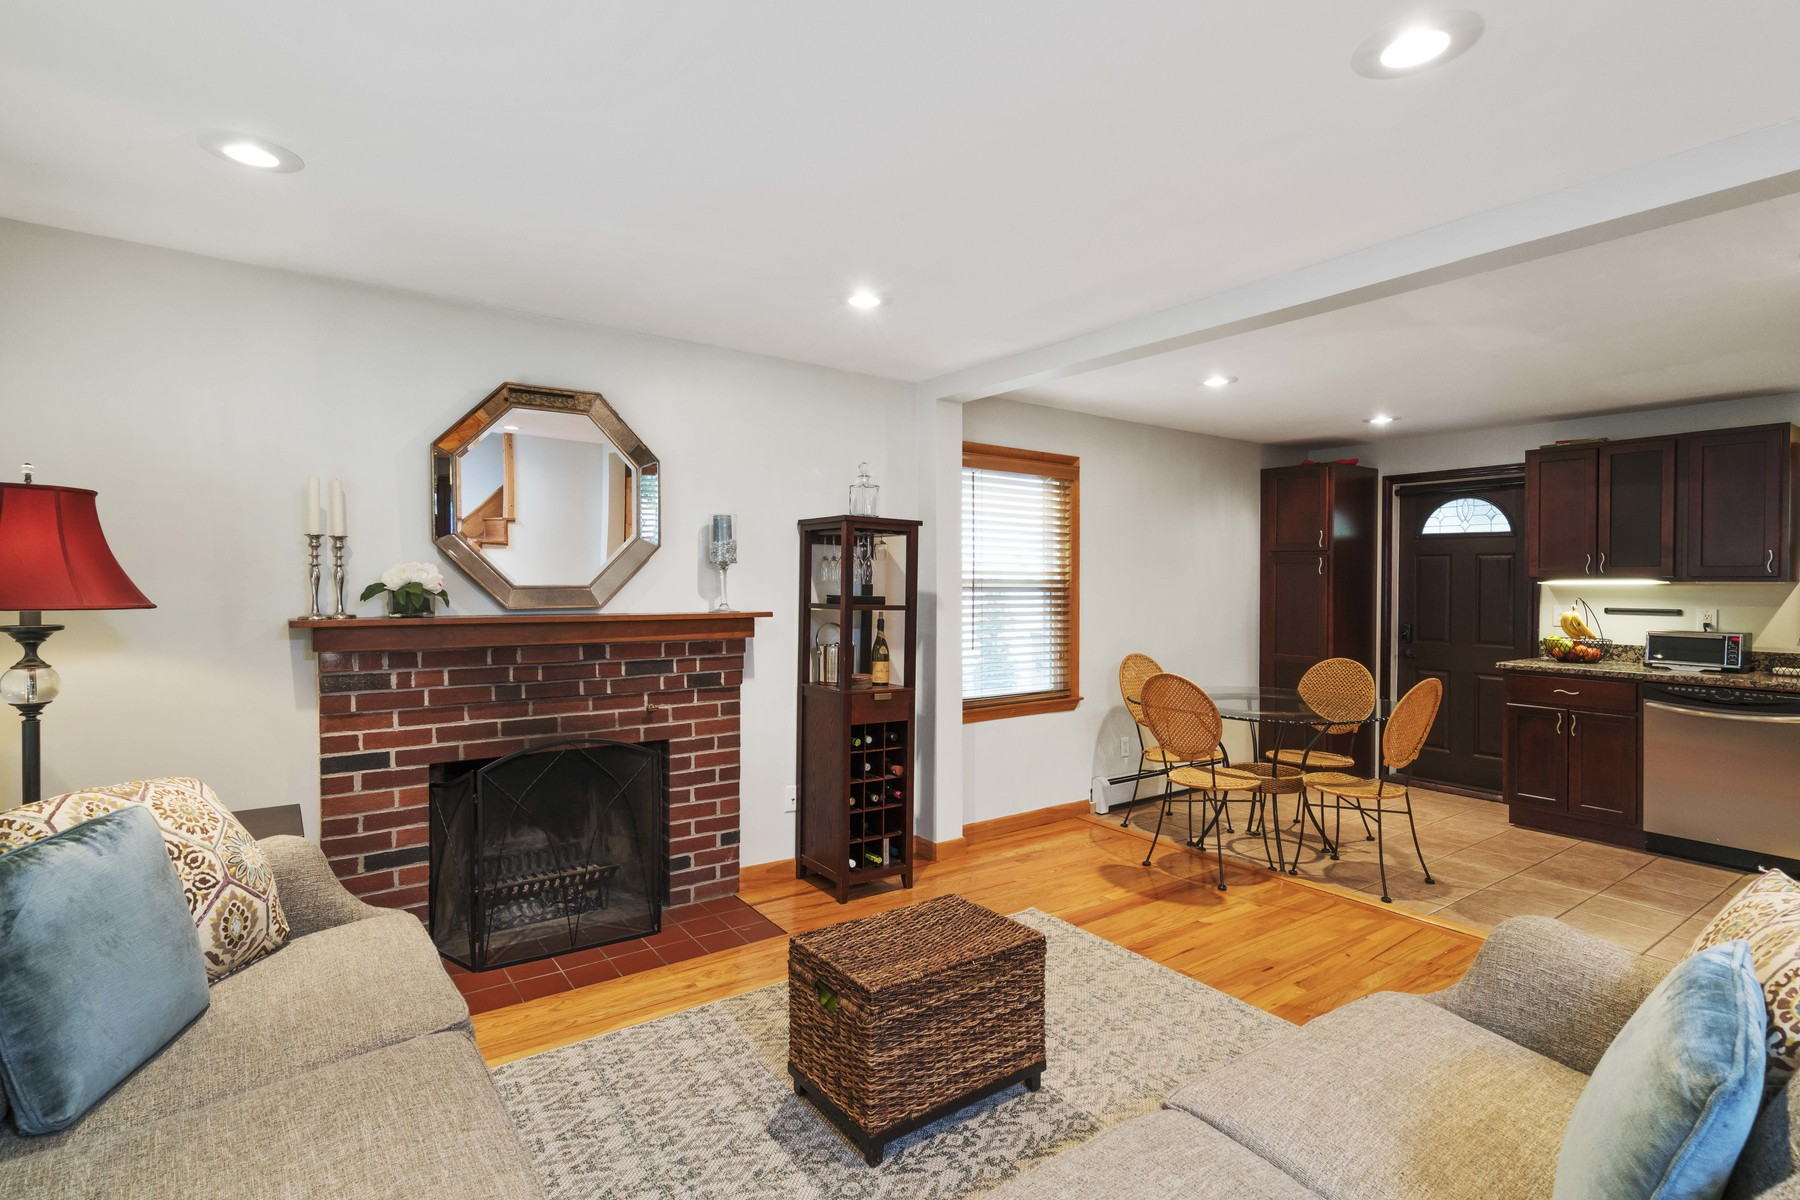 Nhà ở một gia đình vì Bán tại Beautiful and rare Cape home with four bedrooms, two full bathrooms, an open lay 92 Glenellen Rd West Roxbury, Boston, Massachusetts, 02132 Hoa Kỳ